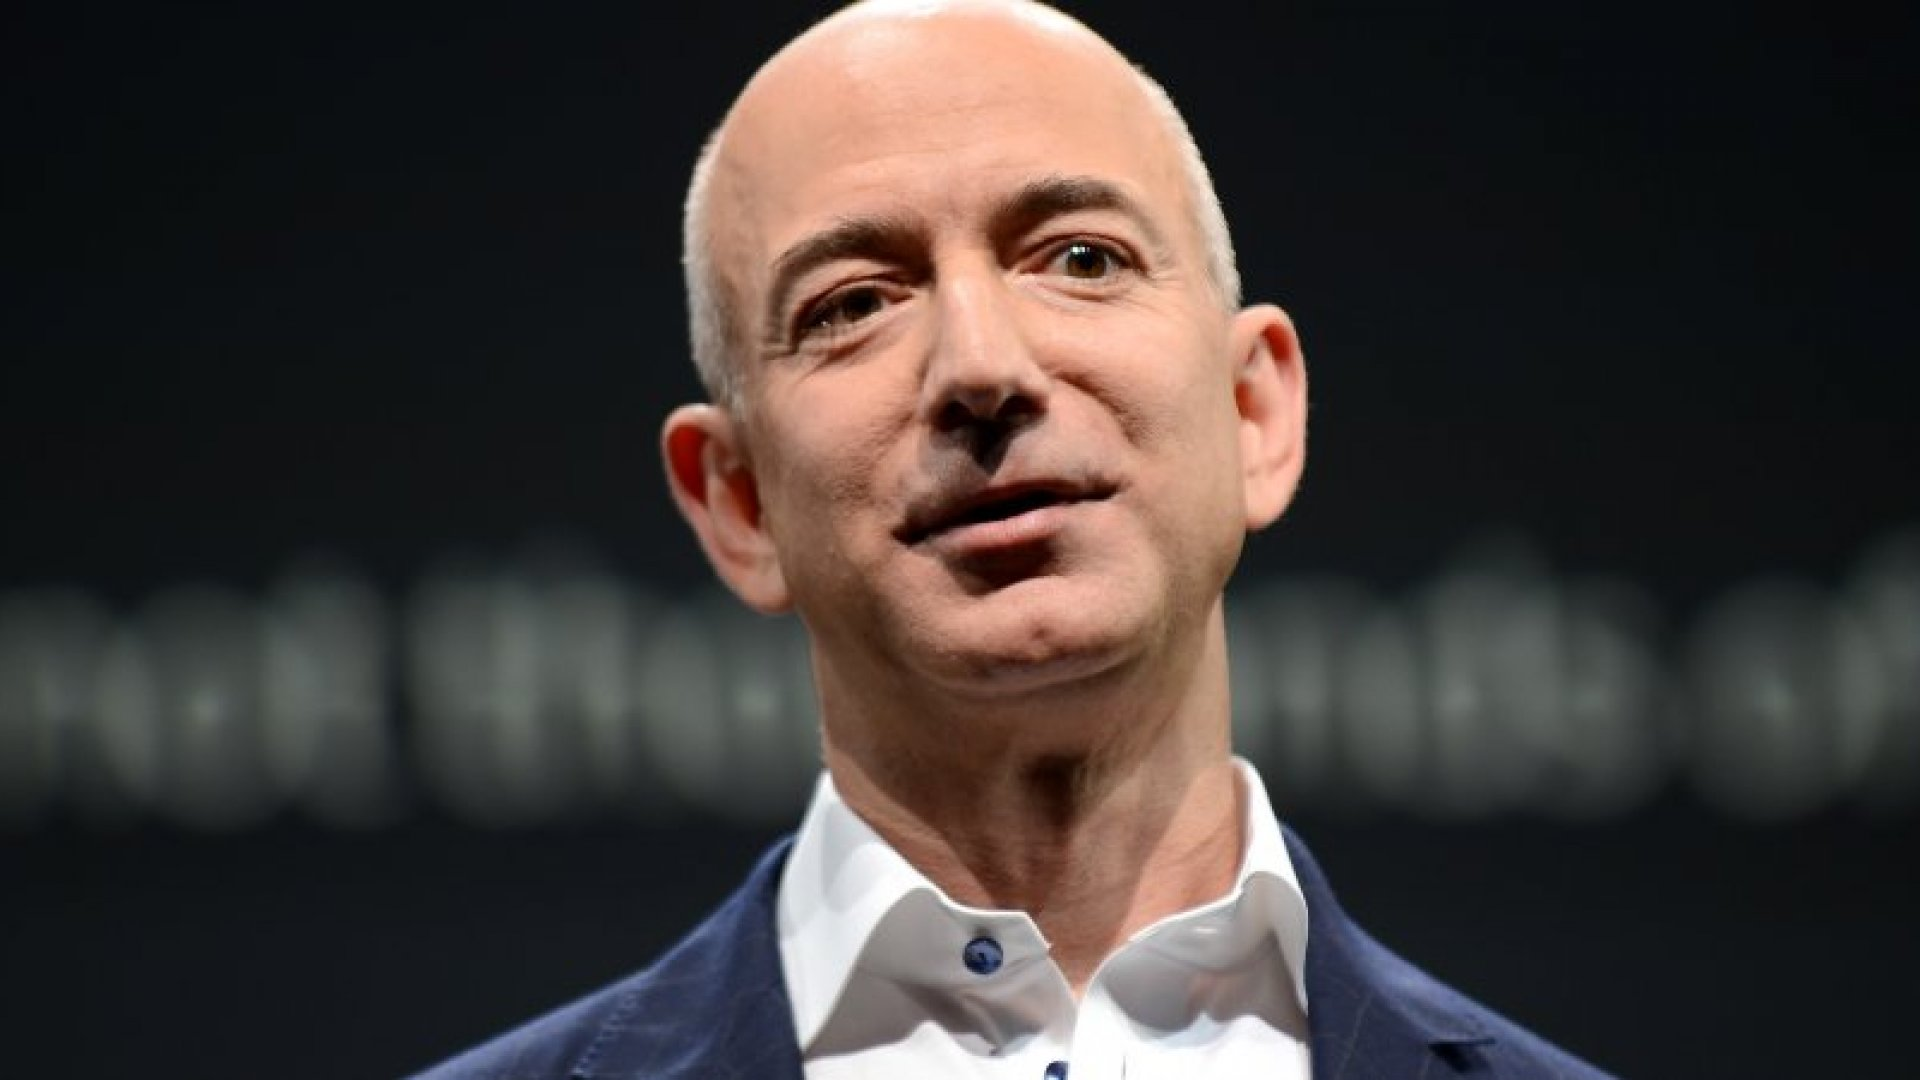 Jeff Bezos's Trick for Hiring Top-Notch Job Candidates